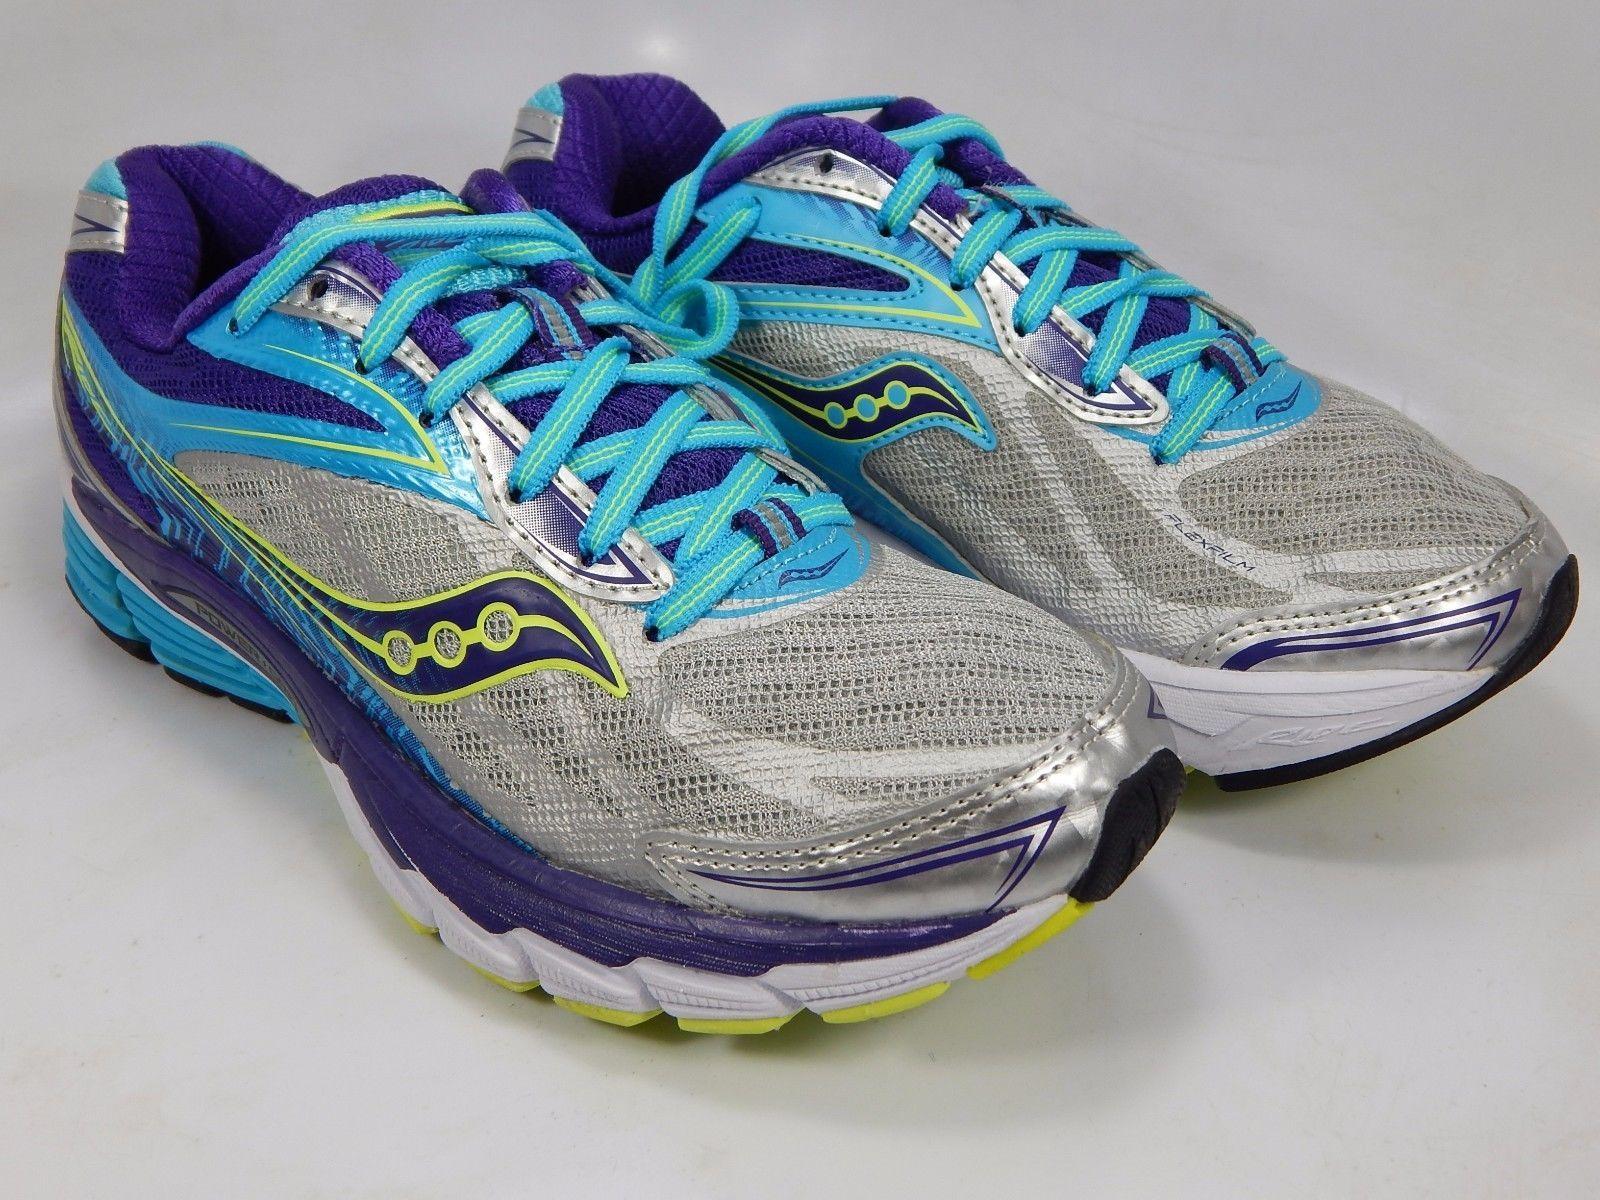 Saucony Ride 8 Women's Running Shoes Size US 7 M (B) EU 38 Silver Blue S10273-1